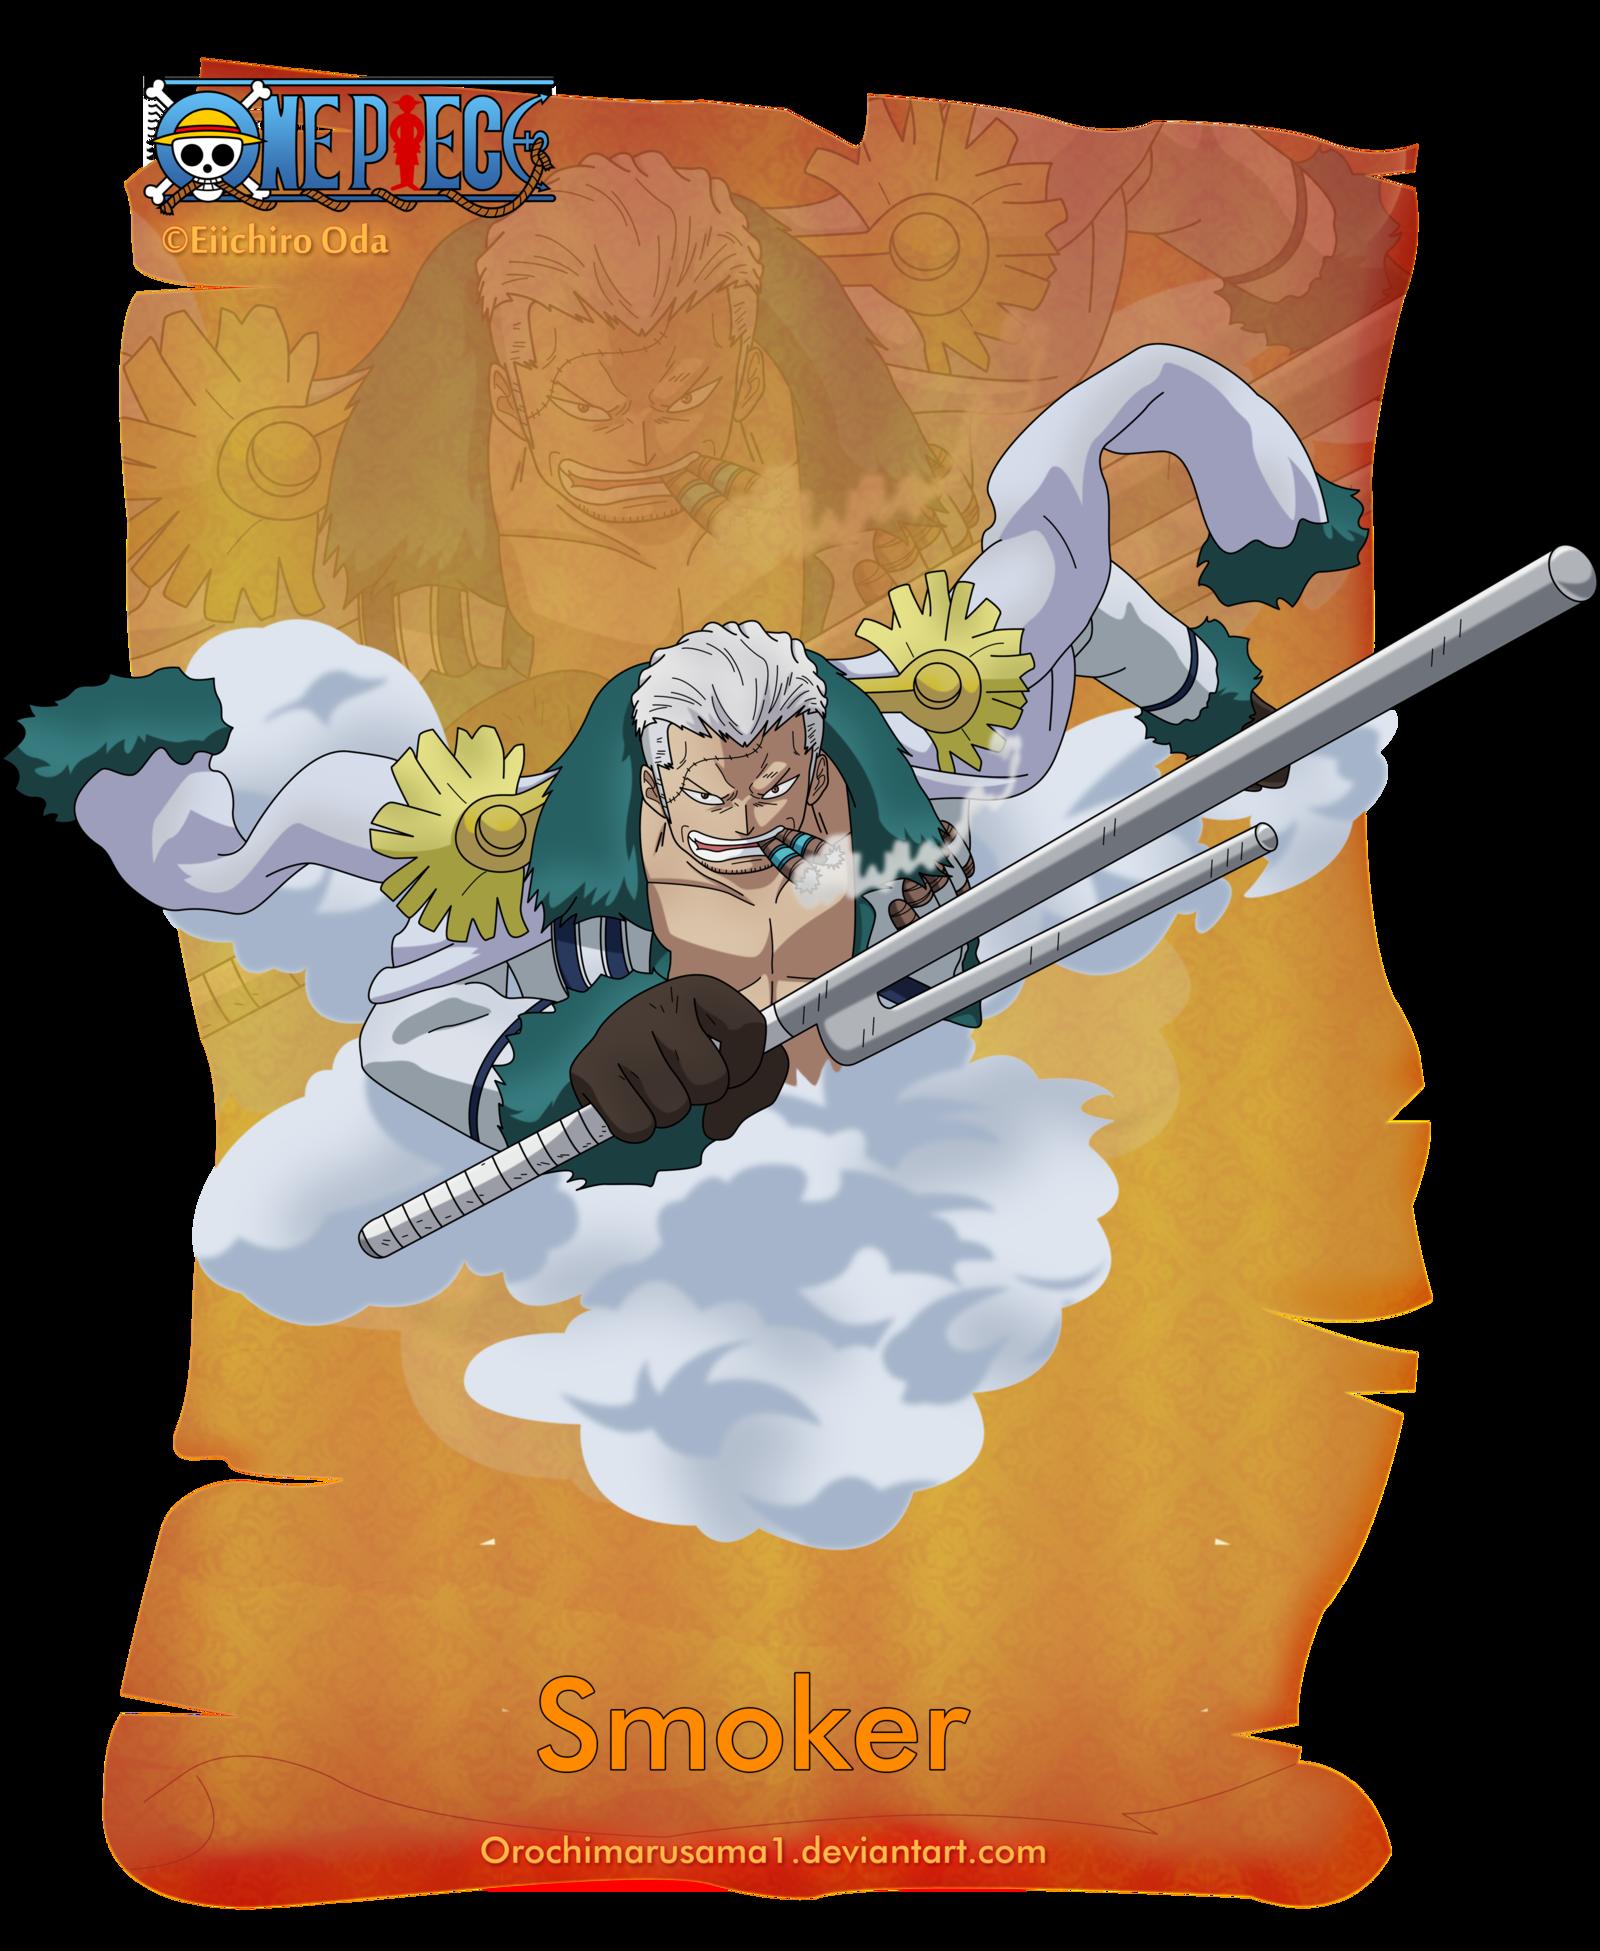 Smoker by orochimarusama1.deviantart.com on @deviantART ...